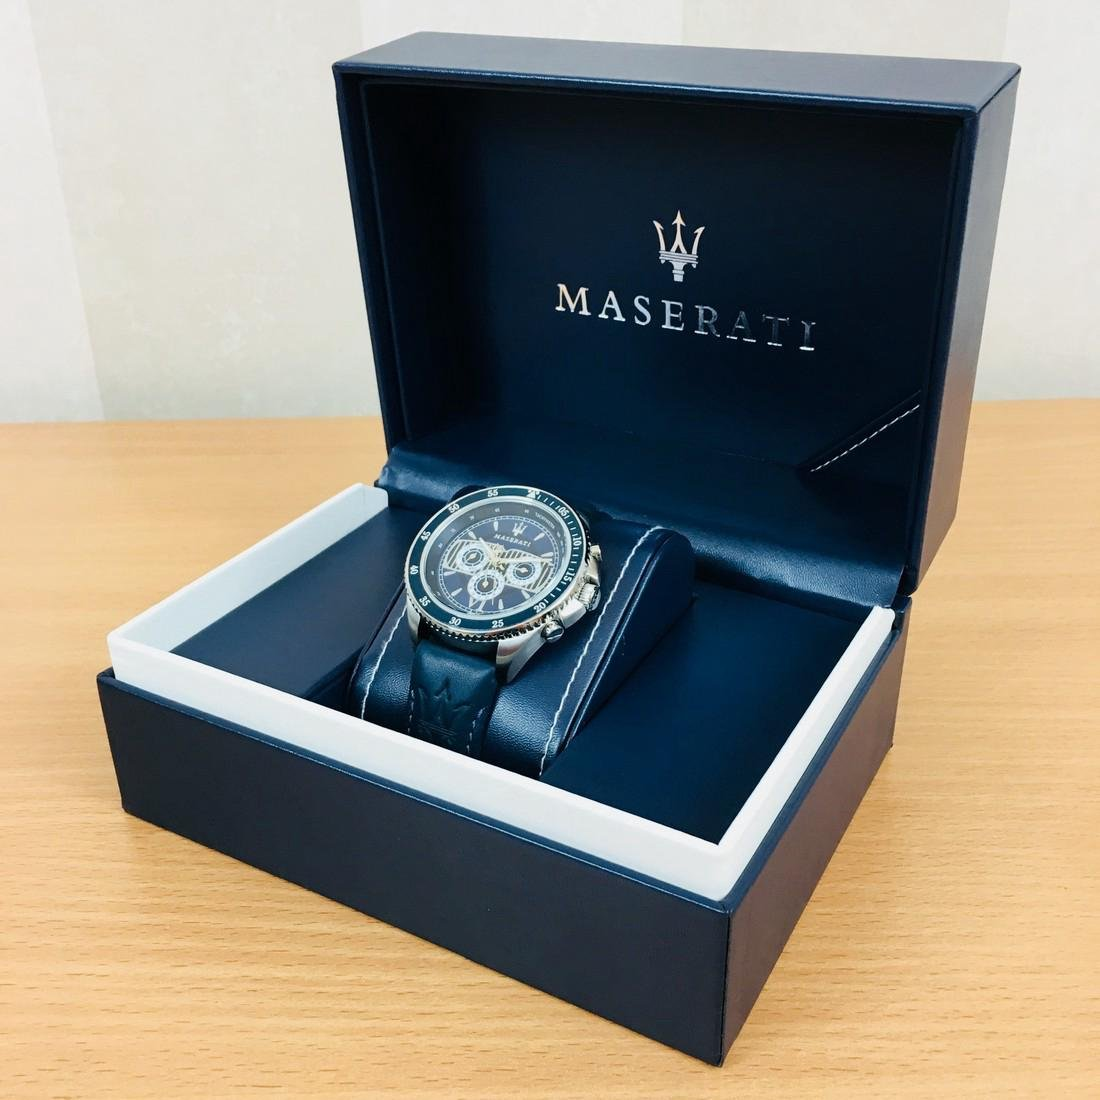 MASERATI – Men's Quartz Chronograph Watch - 3